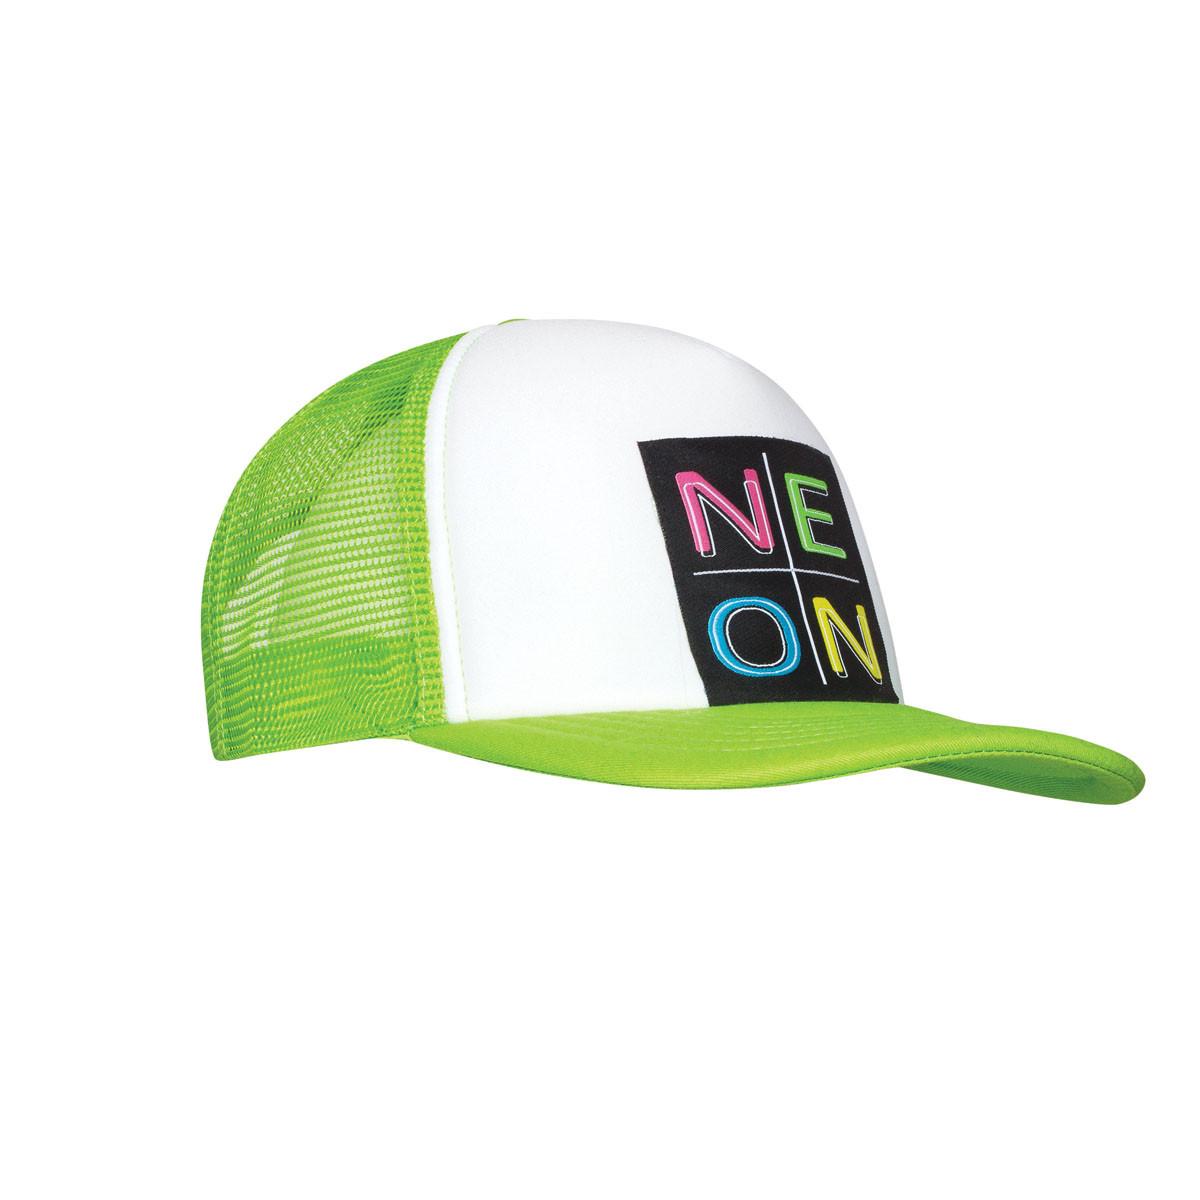 Дитяча кепка для хлопчика BARBARAS Польща XB116 Зелений